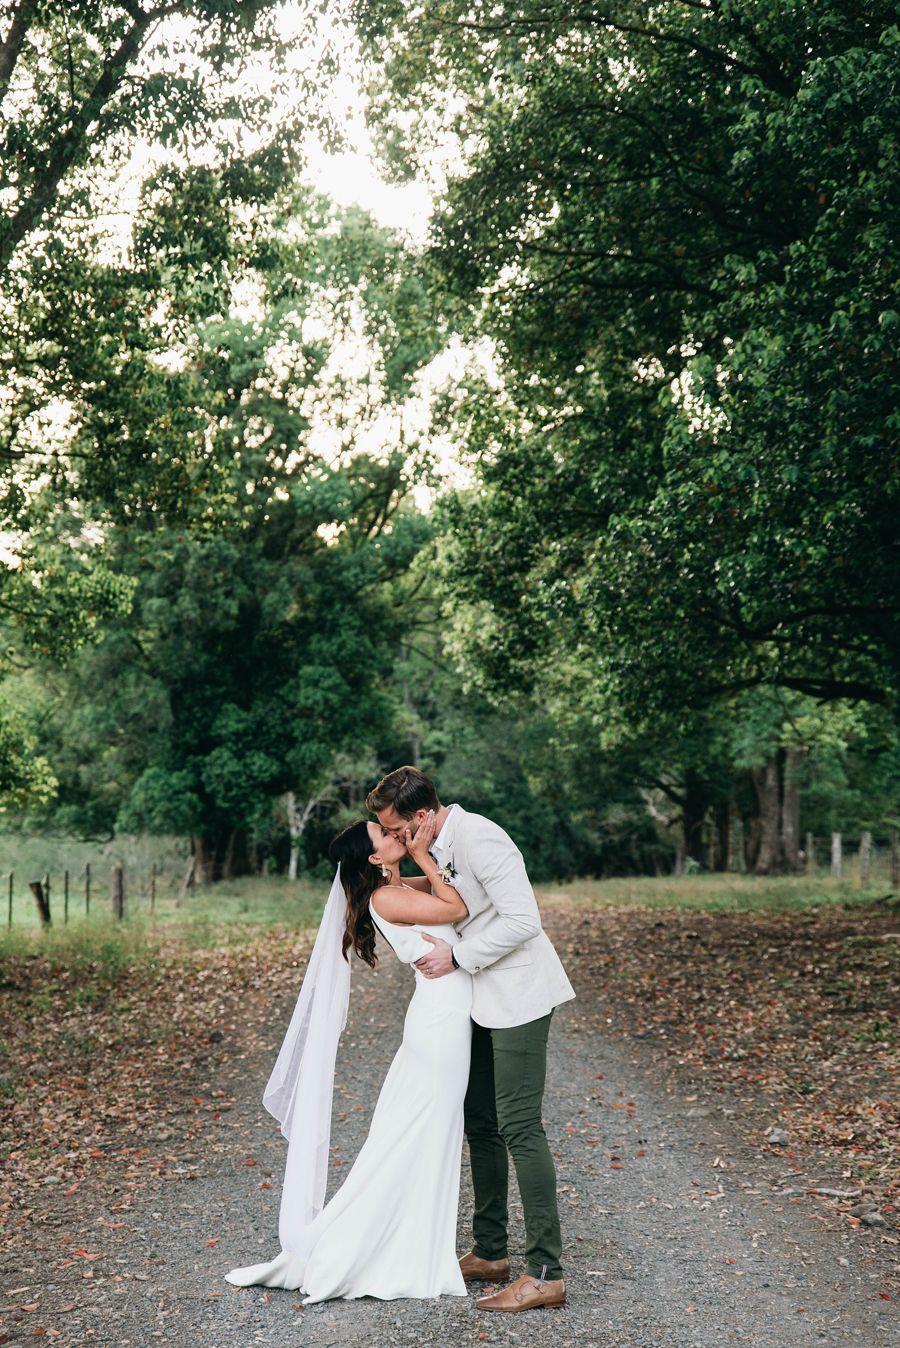 Lucy Luke Bellingen Gleniffer Wedding Photography Coffs Harbour Photographer